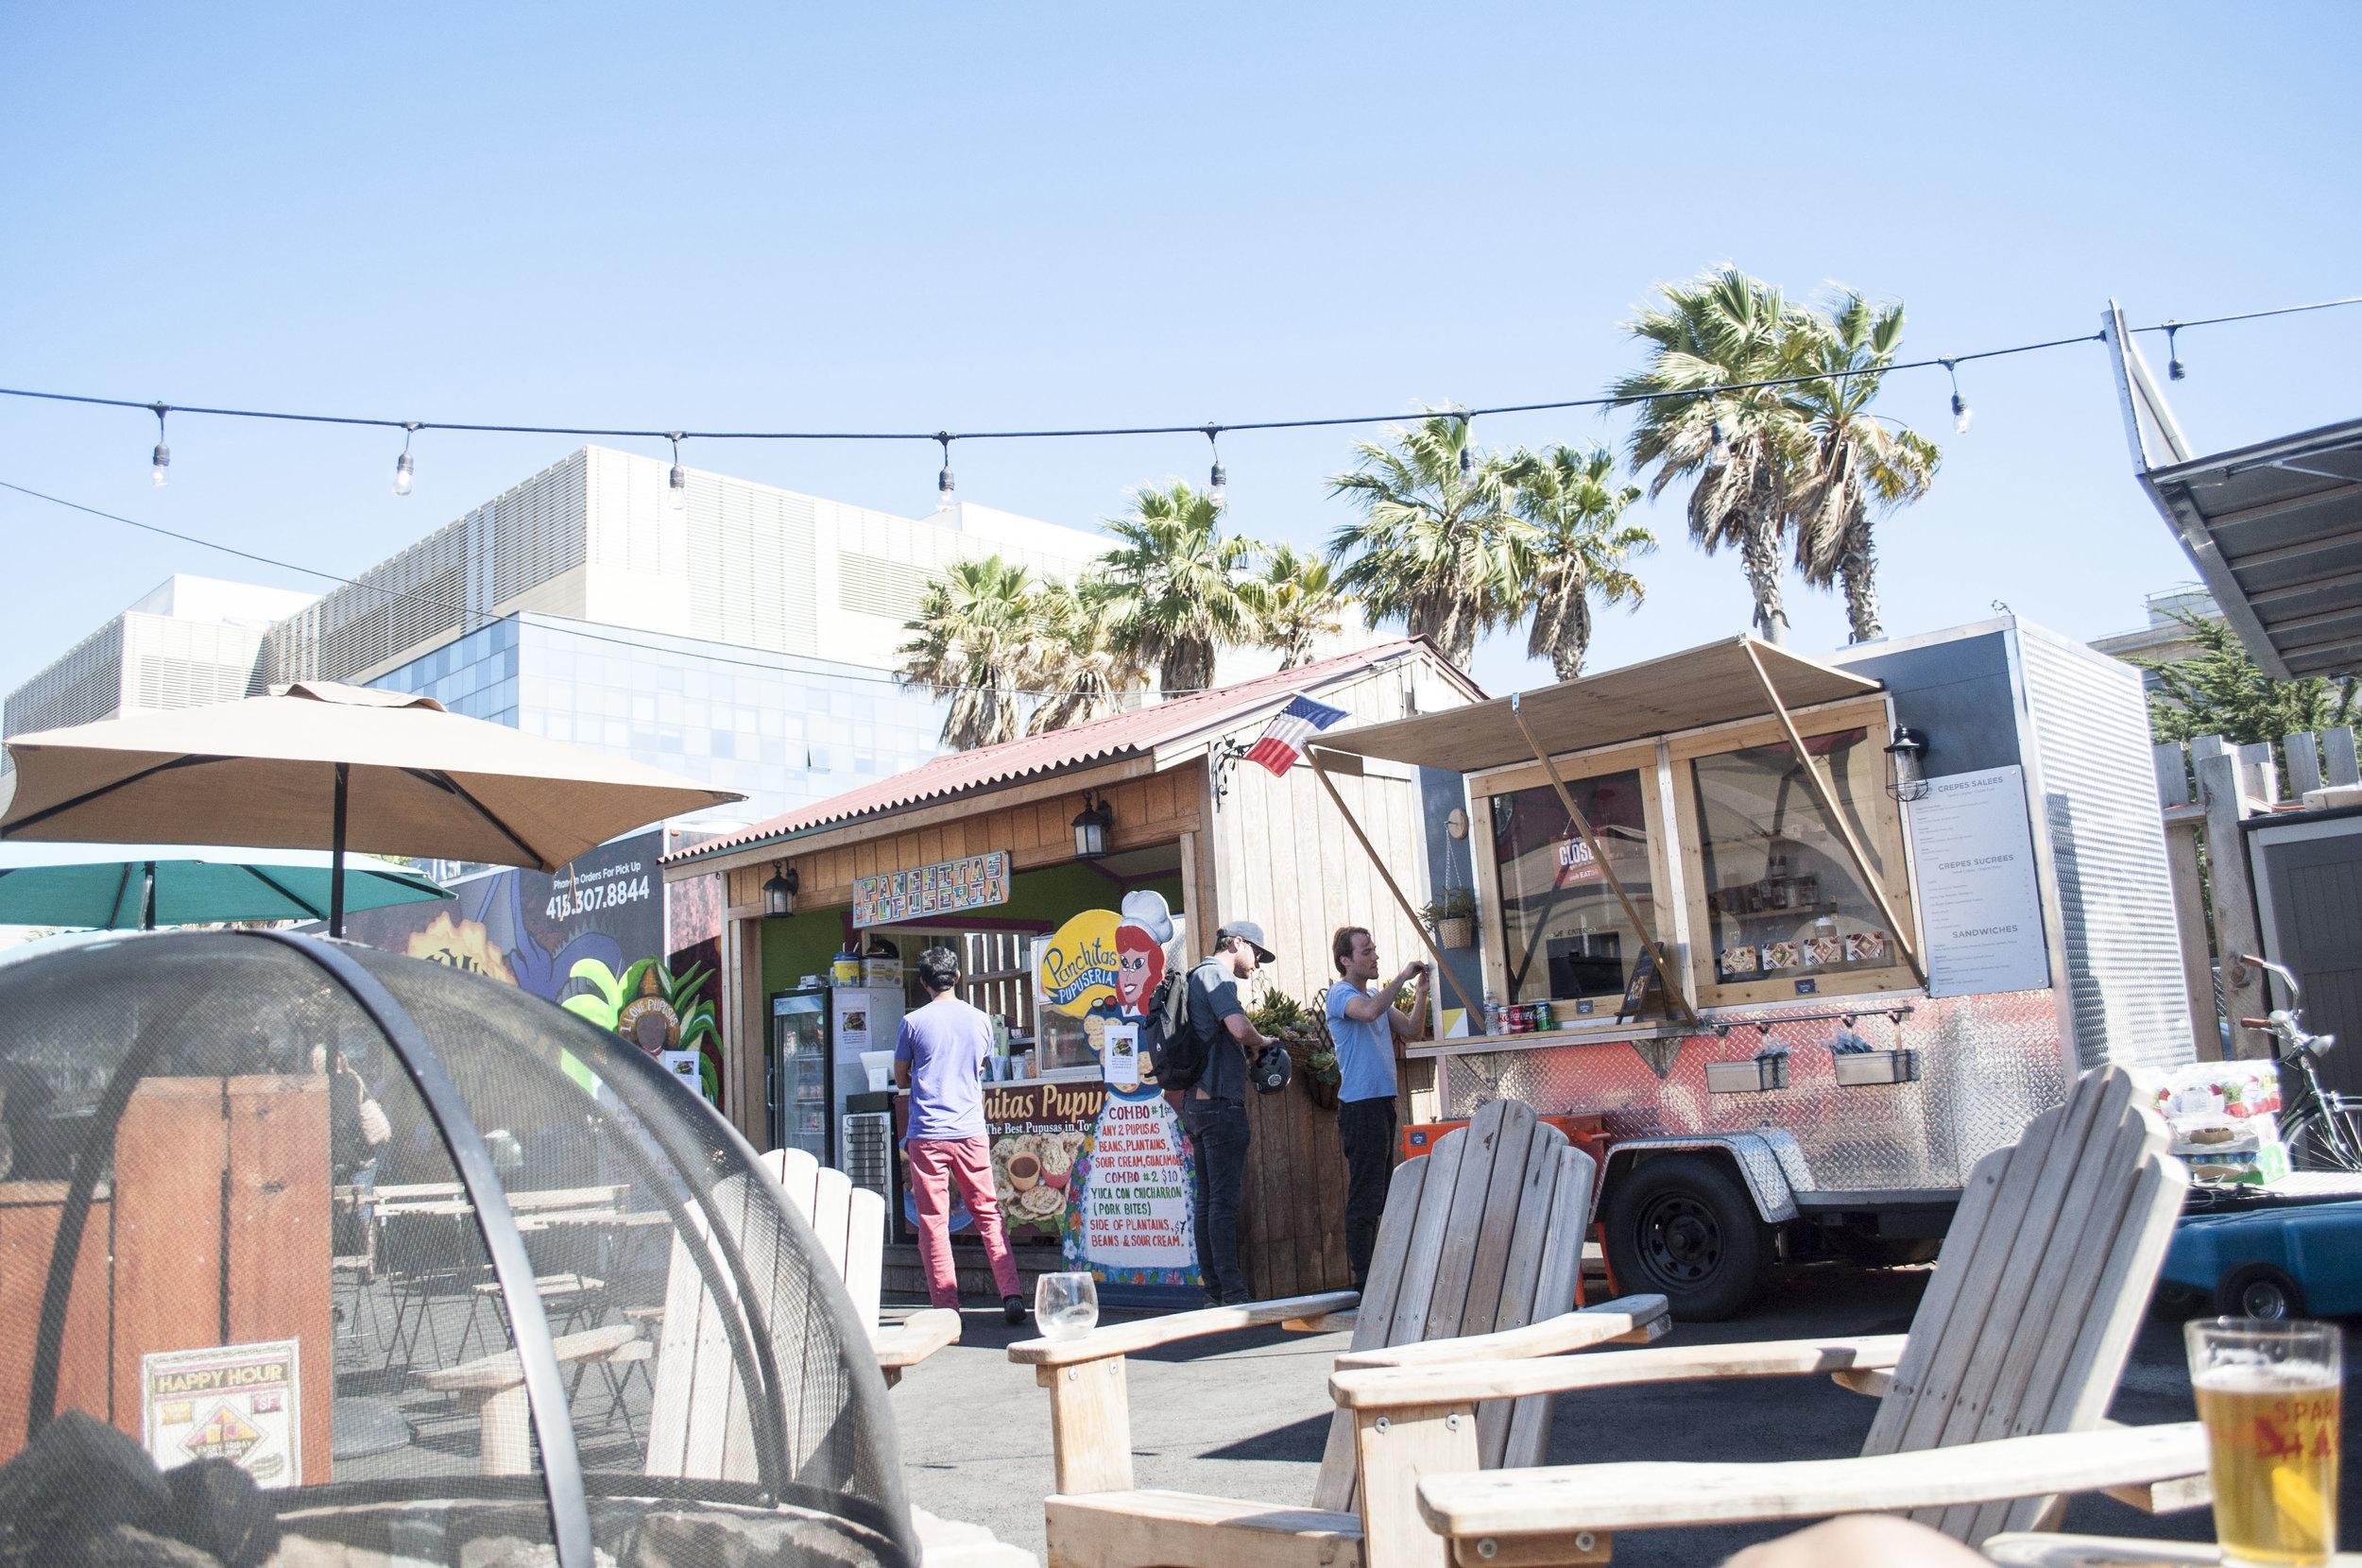 spark social sf food trucks mission bay